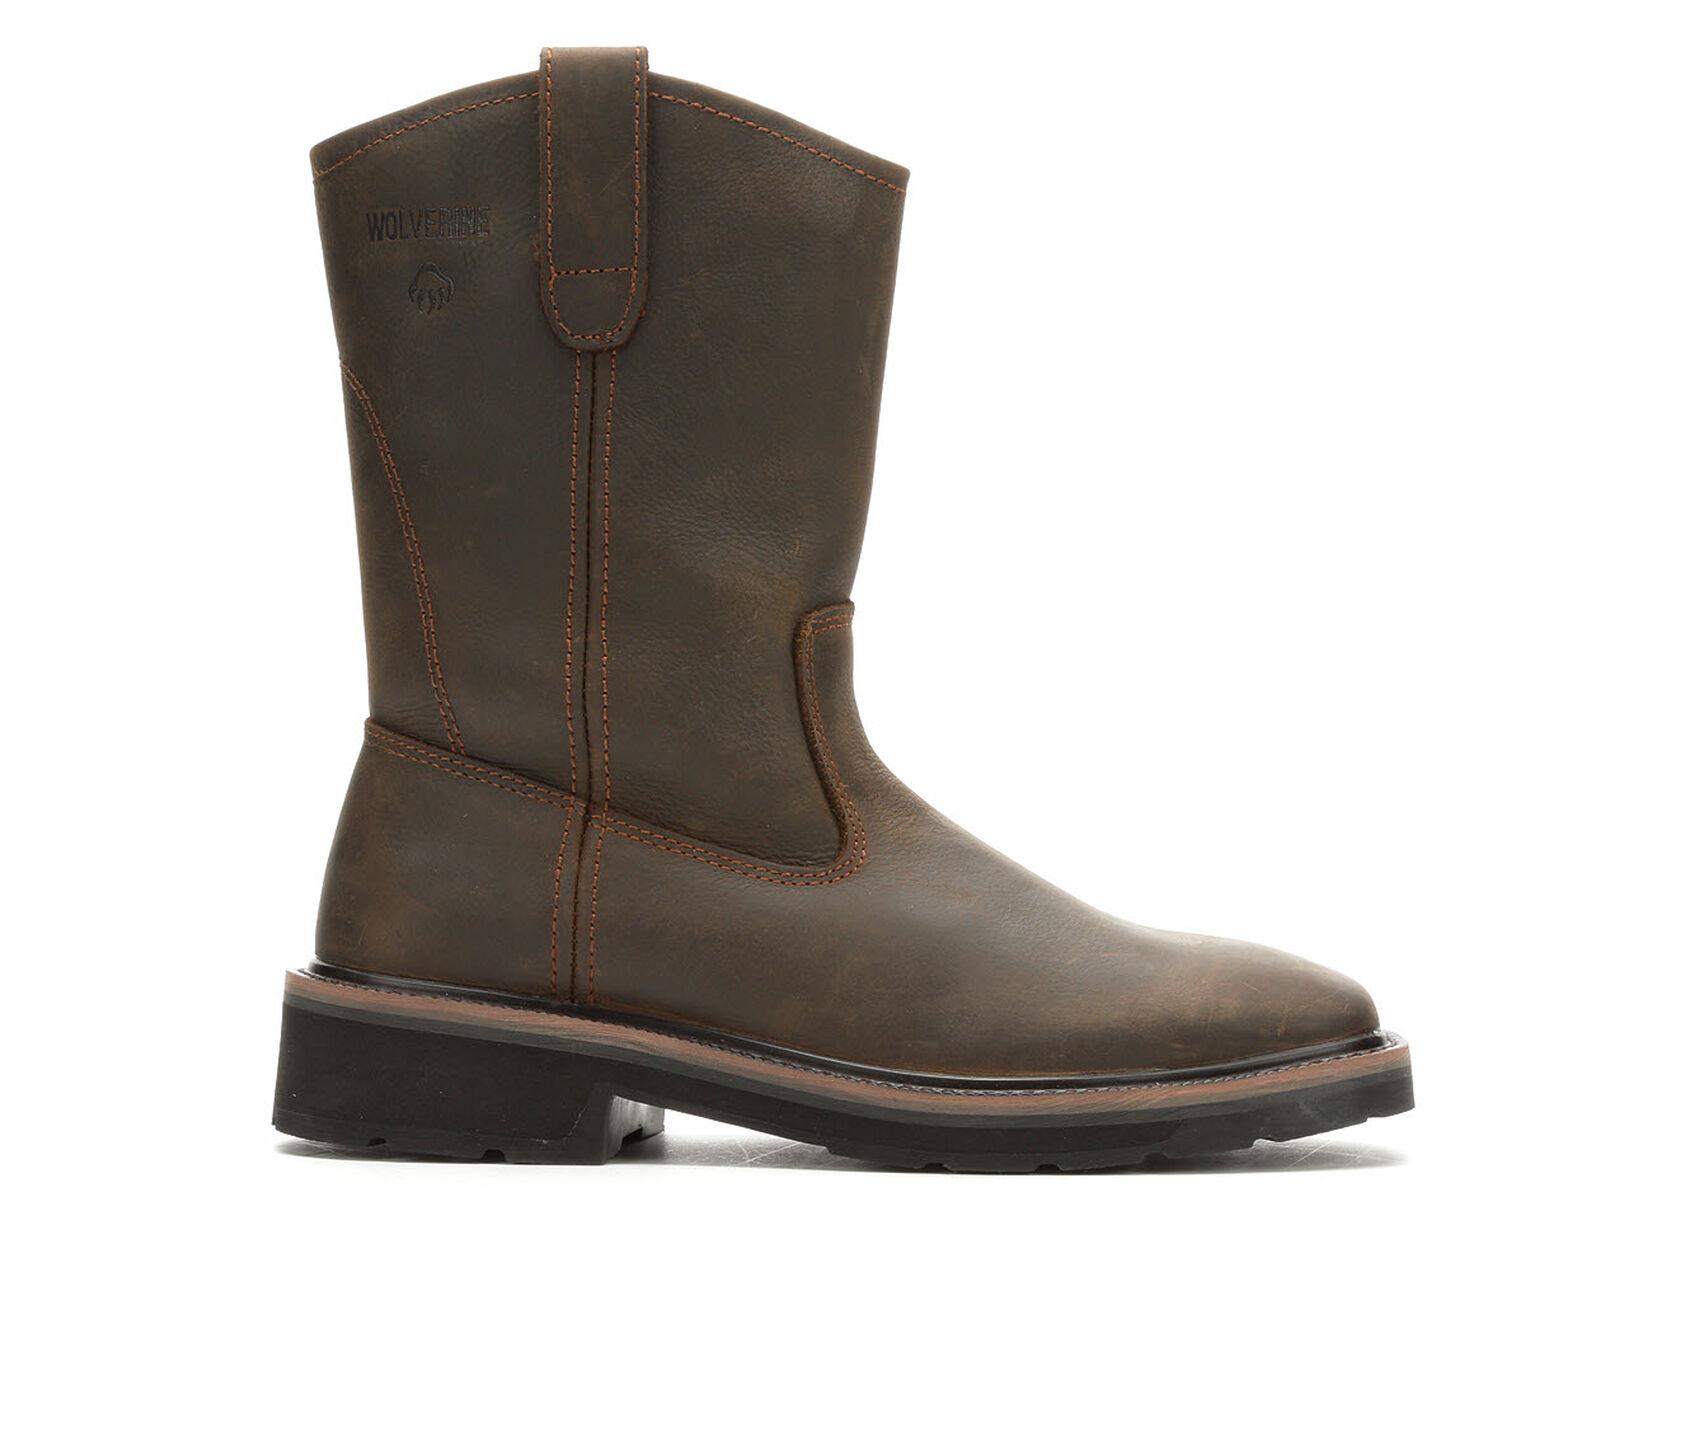 63c210d2992 Men's Wolverine Rancher Square Soft Toe W08181 Work Boots